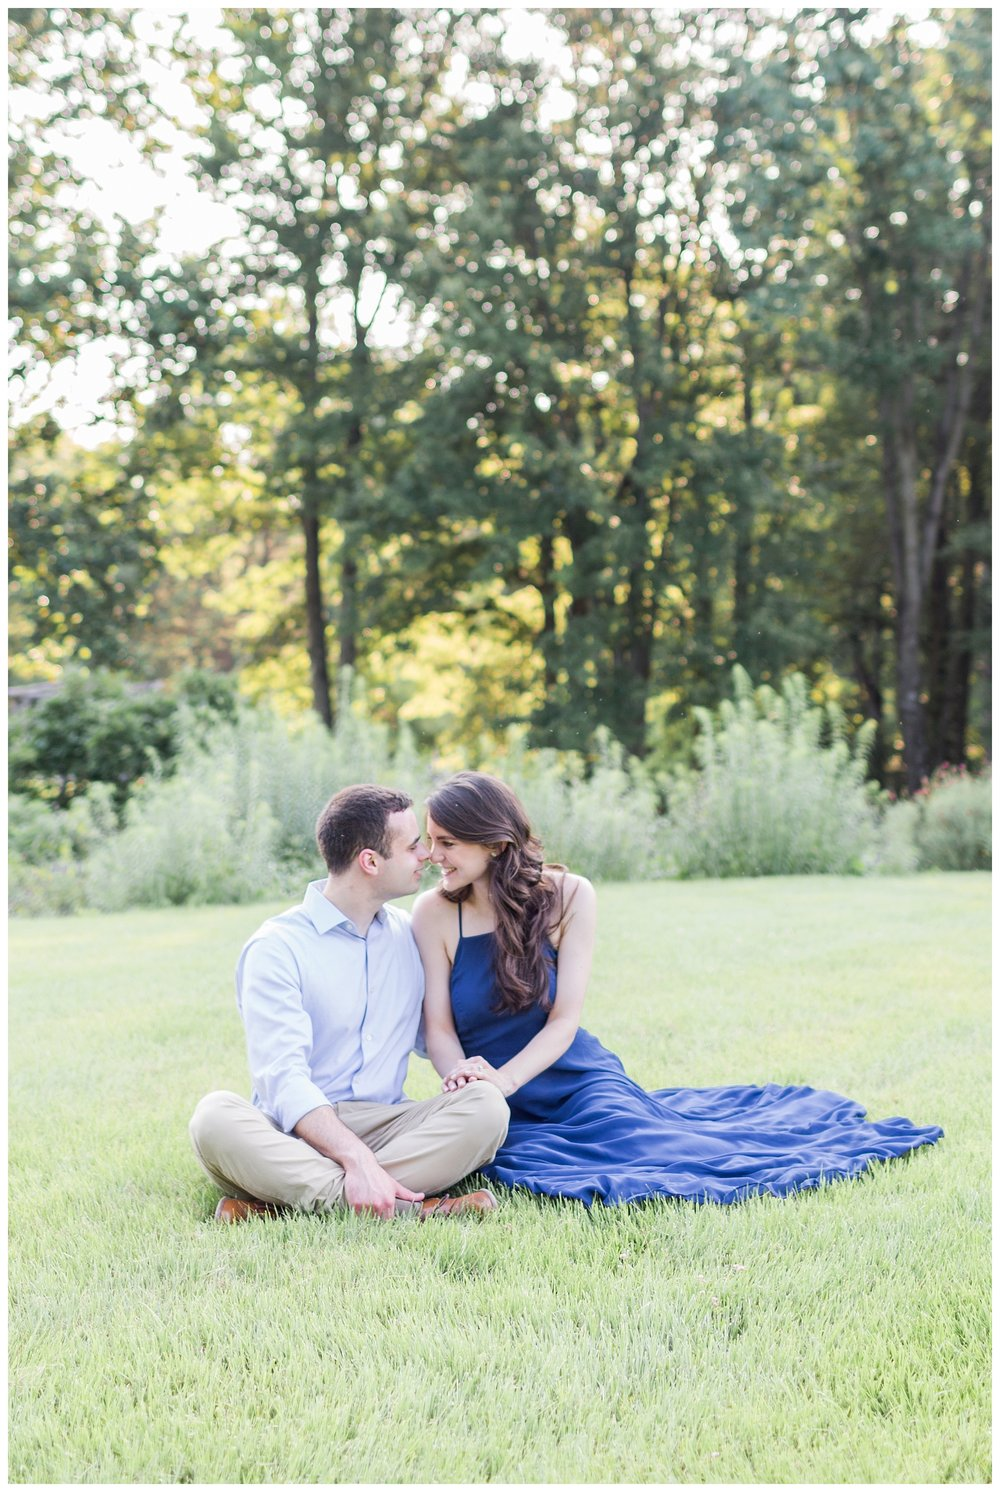 Meadowlark Botanical Garden Engagement | Virginia Wedding Photographer Kir Tuben_0038.jpg